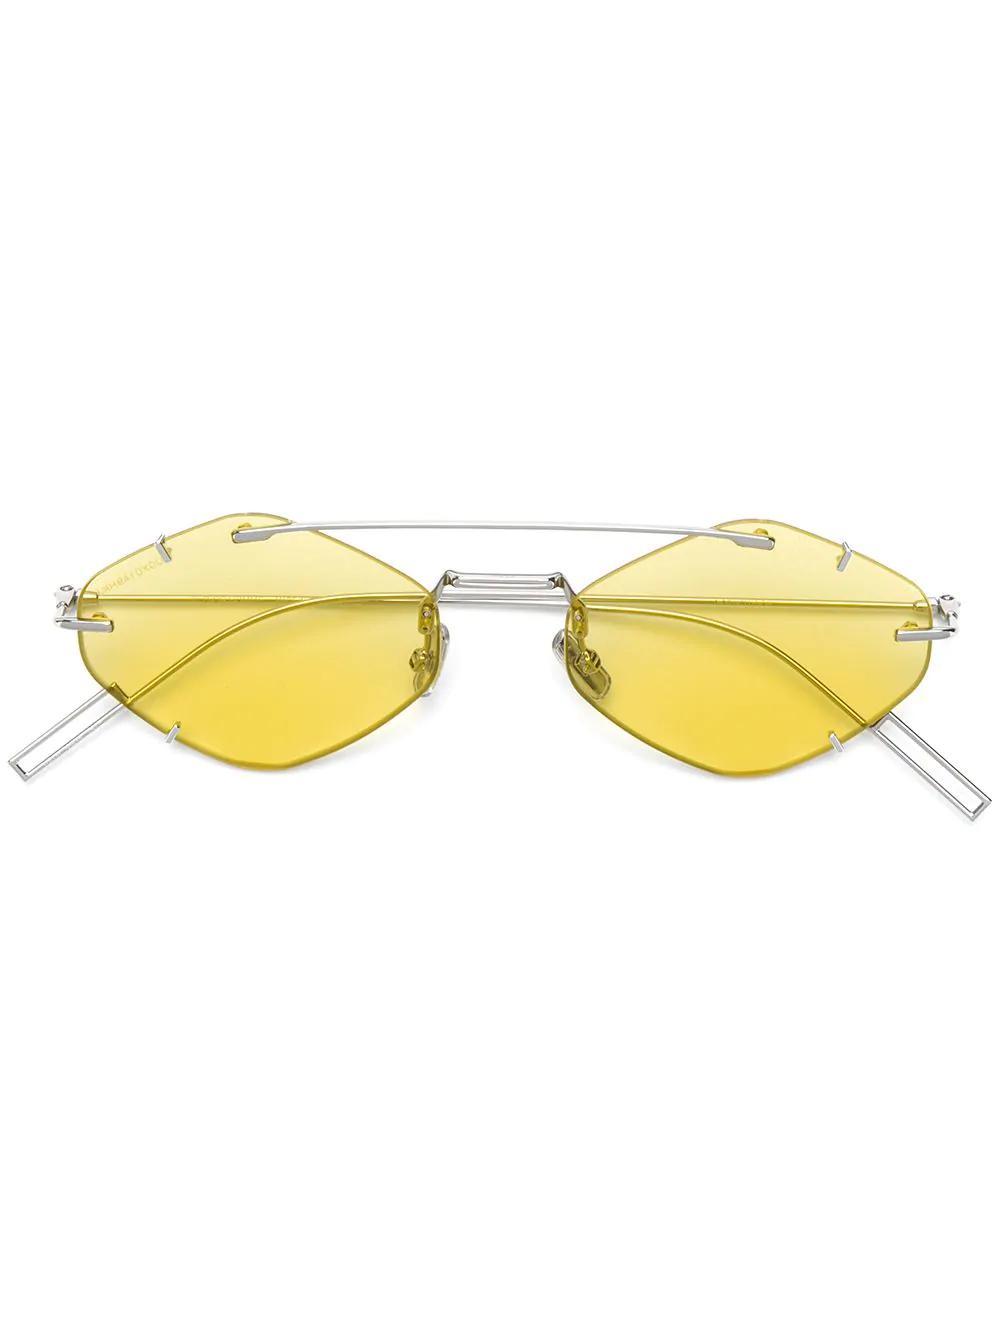 565fd0e8329b Dior Geometric Shaped Sunglasses In Silver | ModeSens